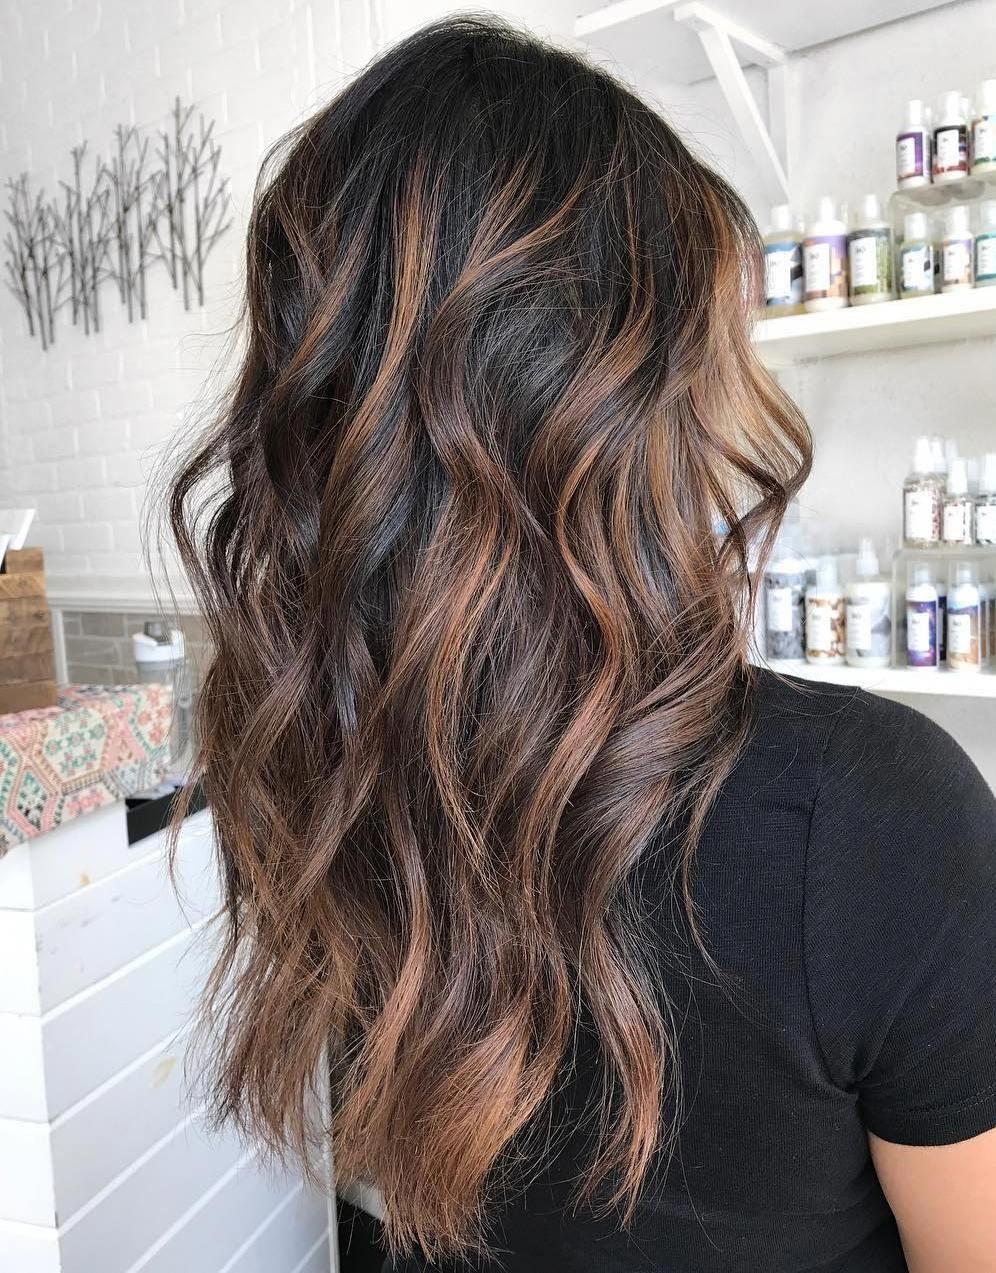 Roasted Almond Highlights Haircolor Brown Hair With Highlights Hair Highlights Cool Brown Hair